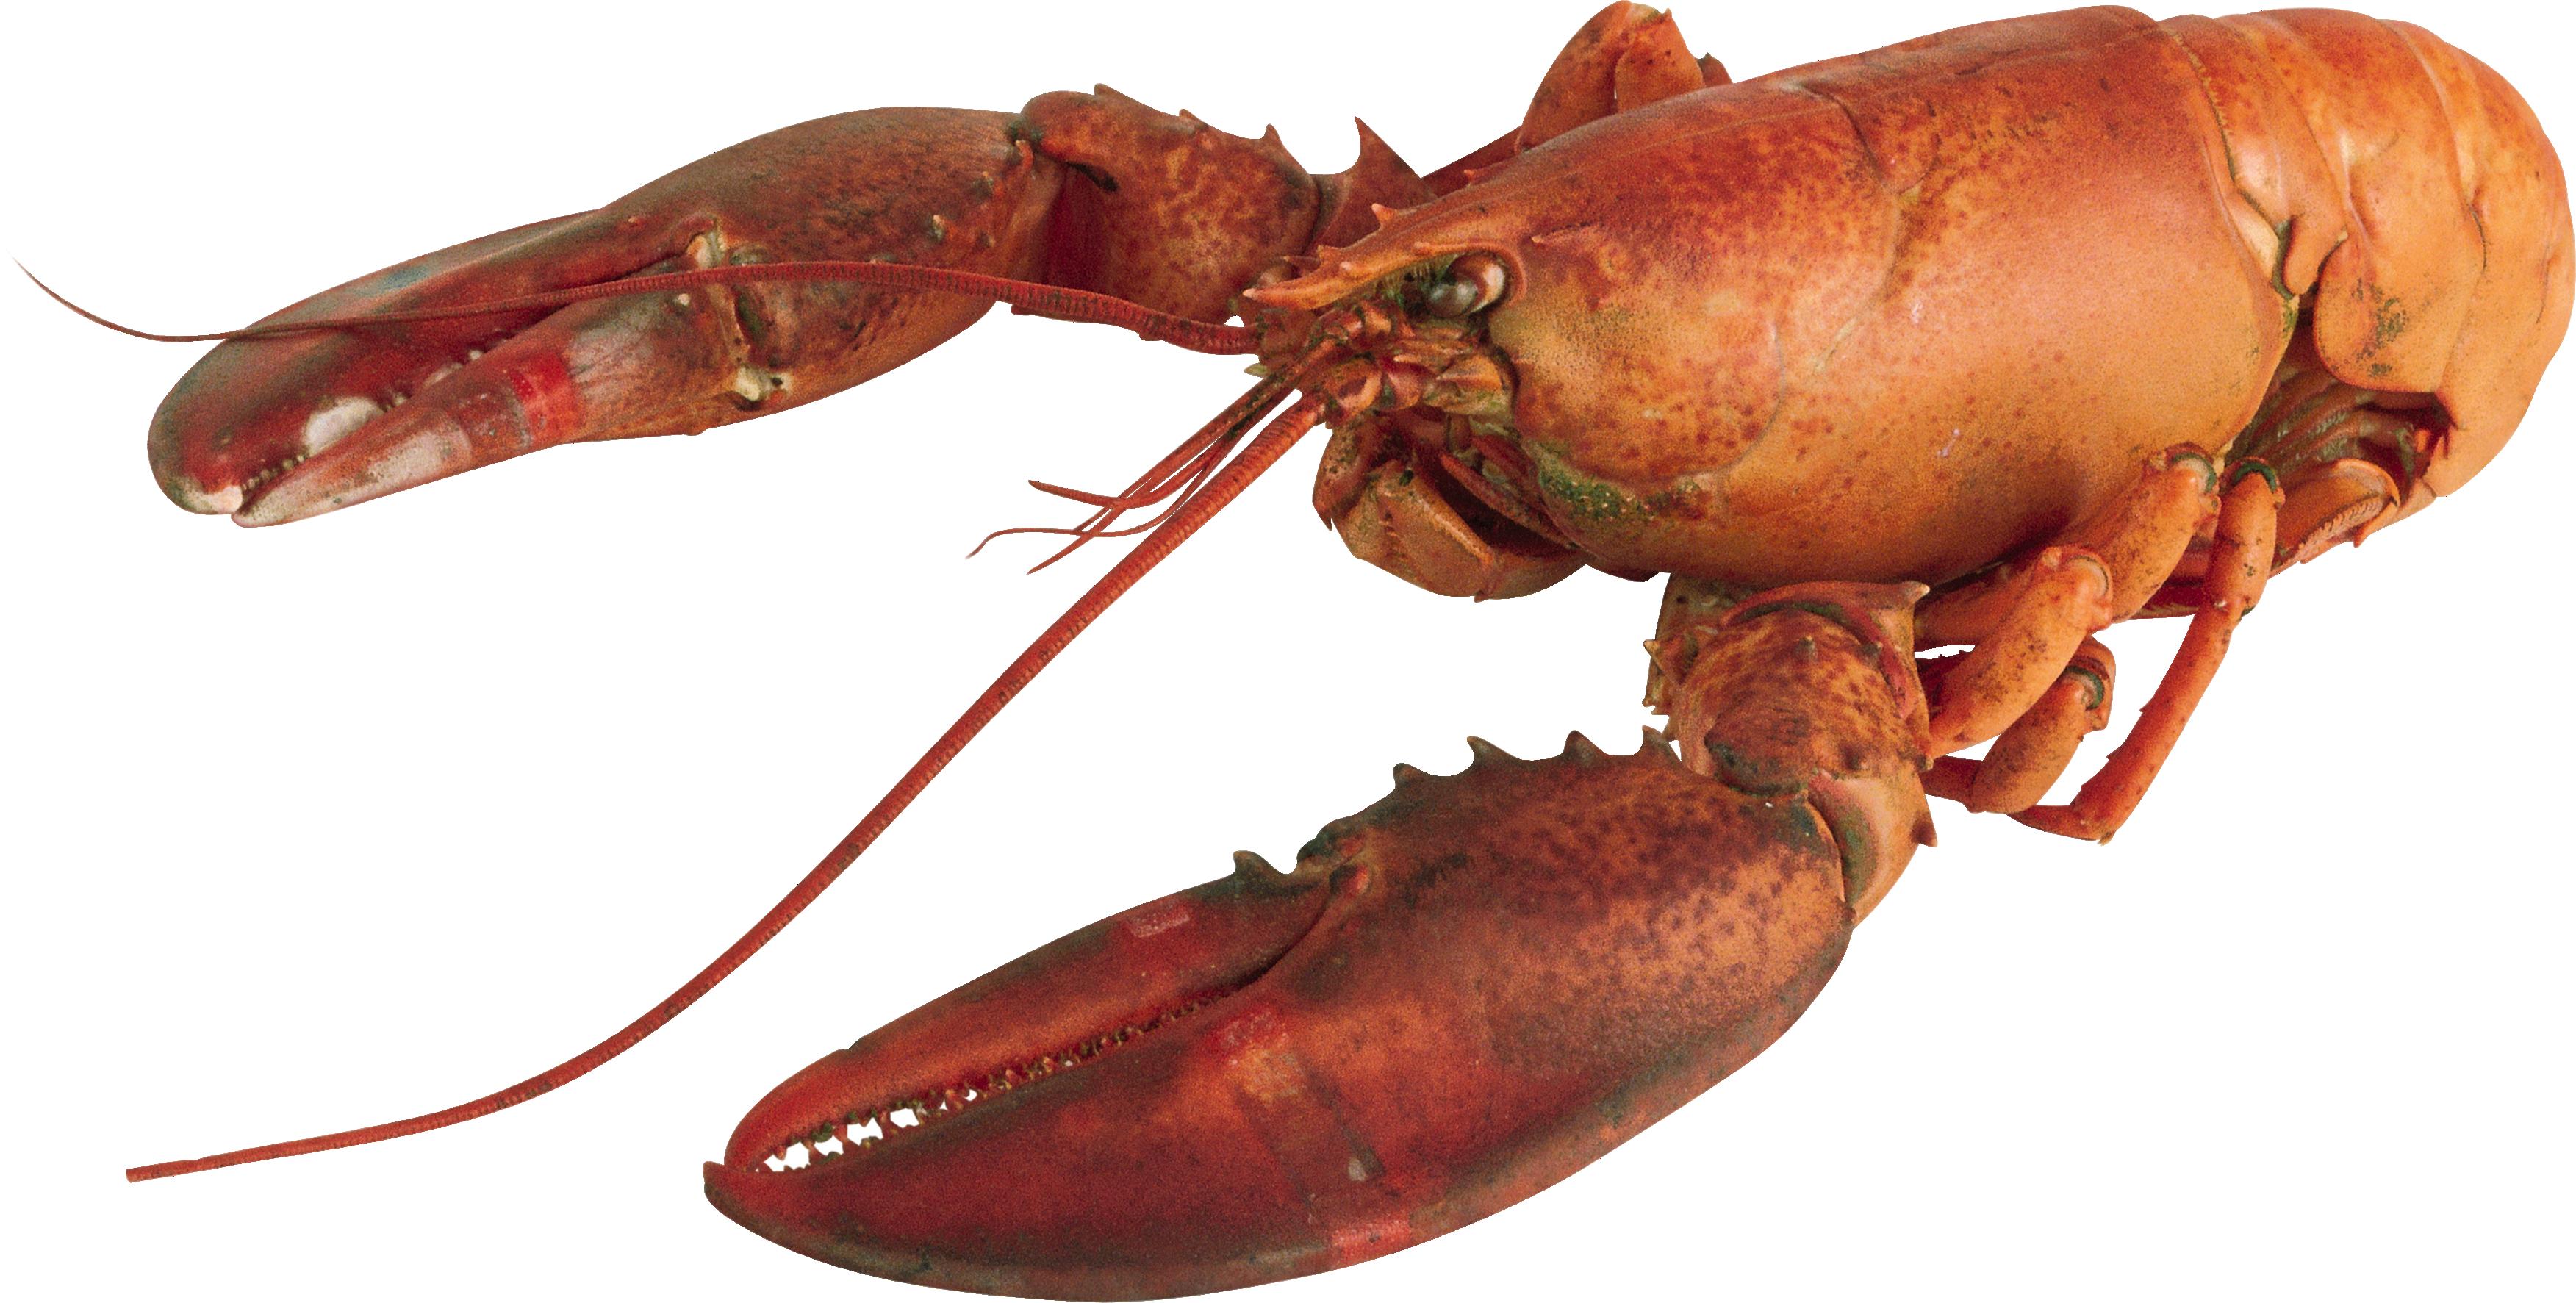 Transparent png file web. Lobster clipart lobster dish